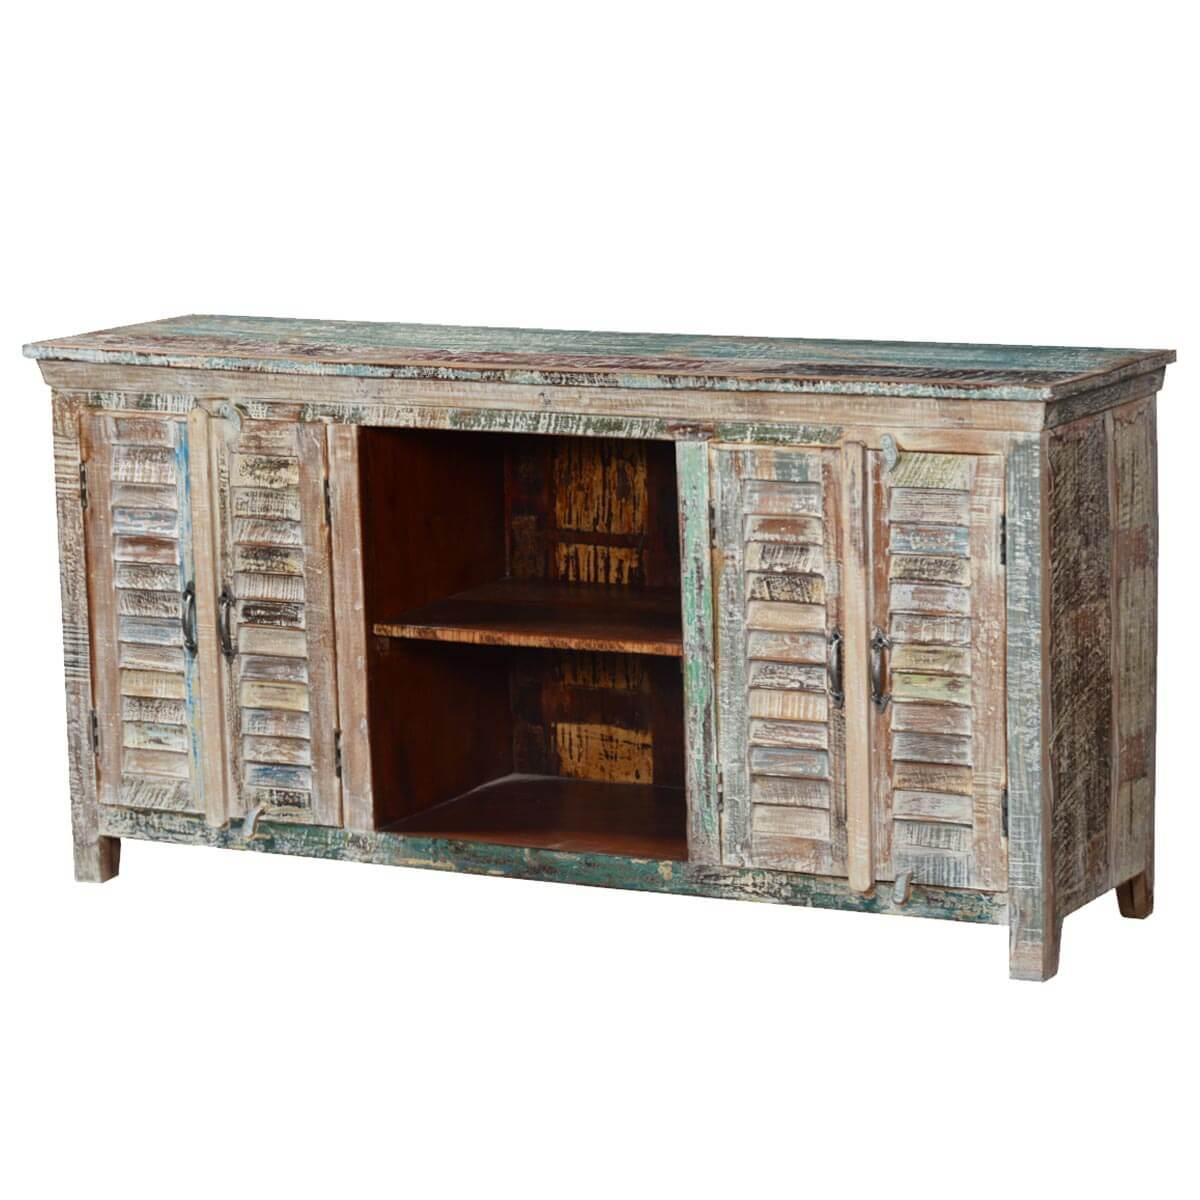 Appalachian rustic winter mango wood tv console media cabinet